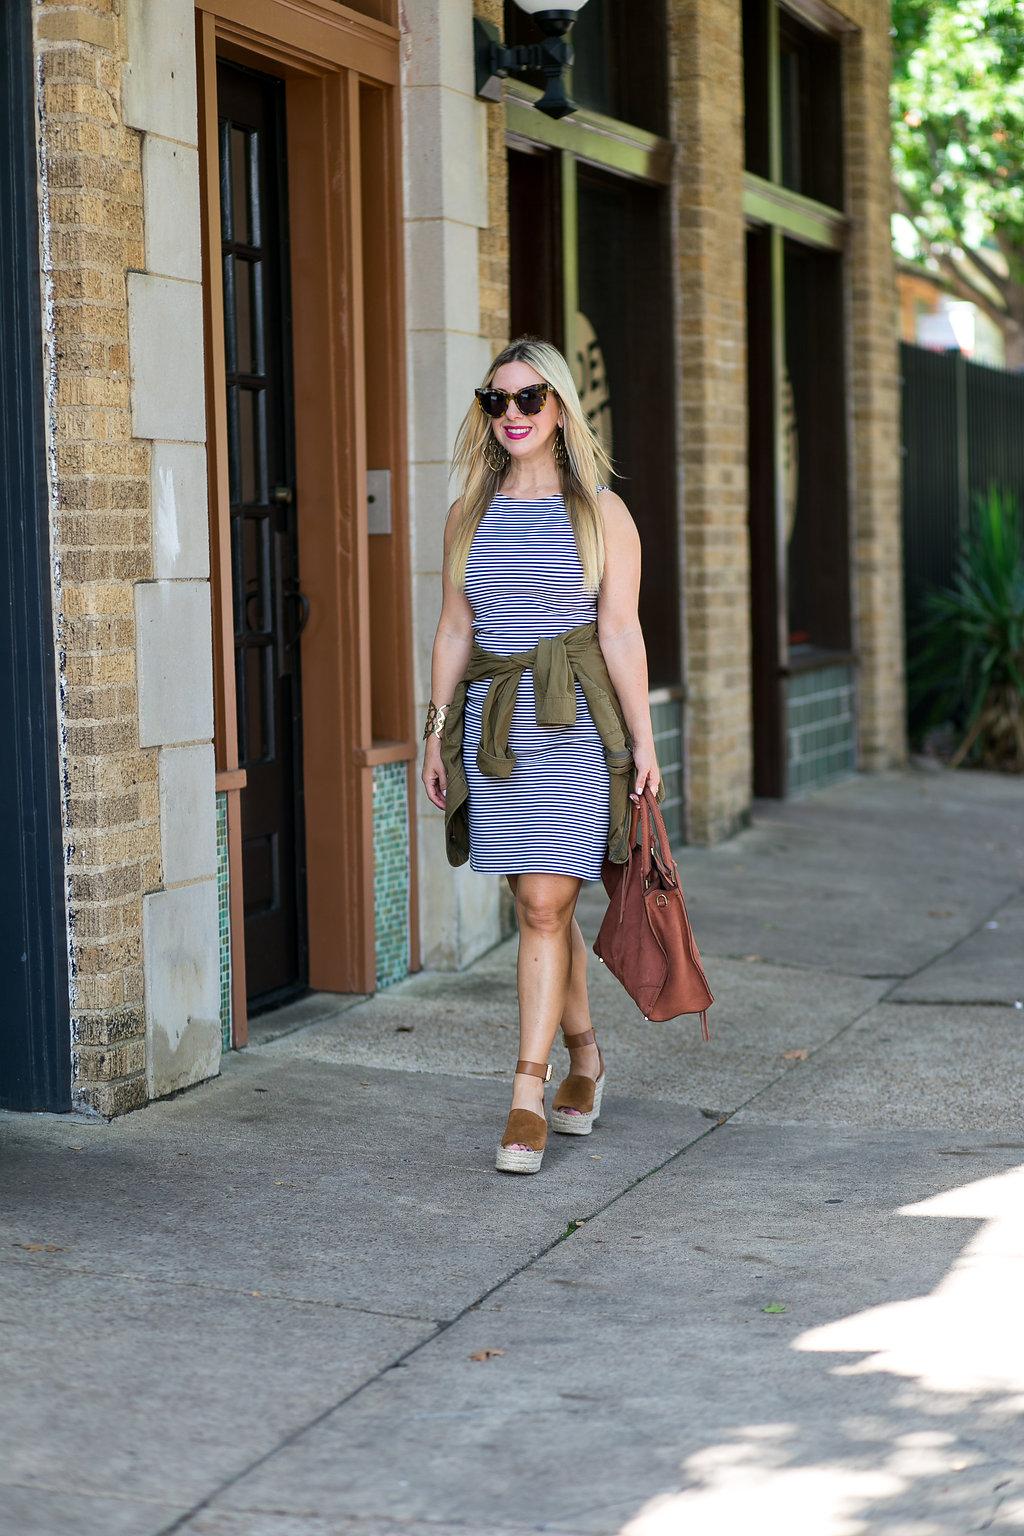 Theory Striped Dress - The Darling Petite Diva Blog